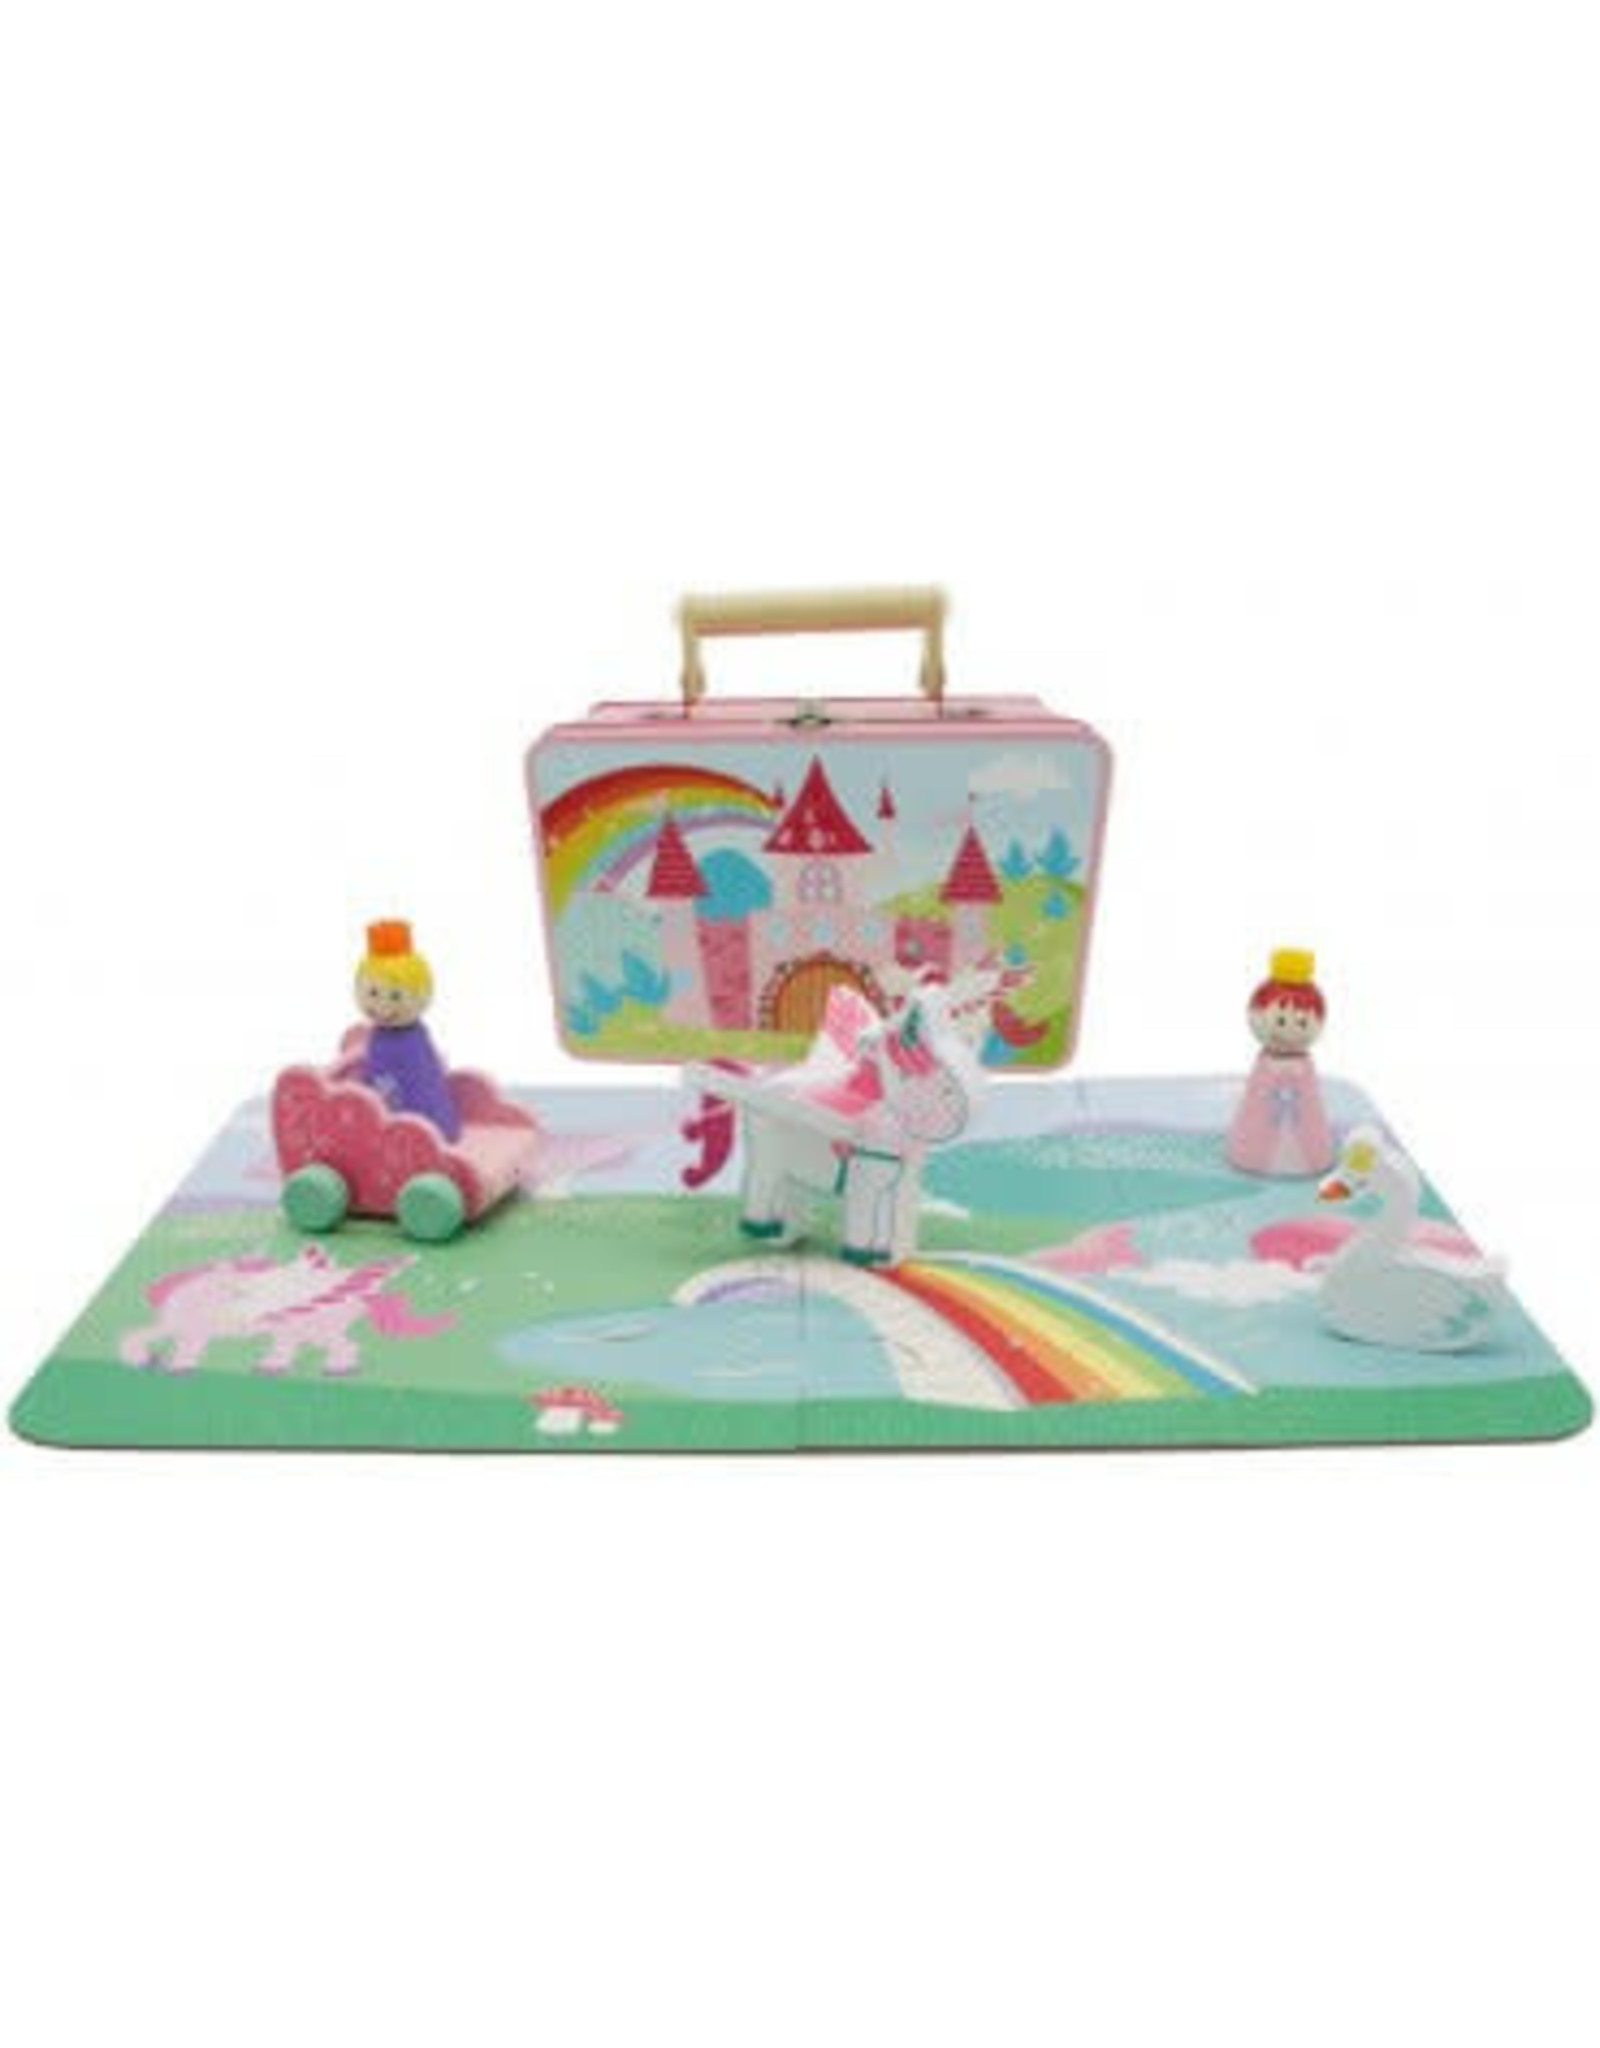 Toyslink Wooden Unicorn Playset in Tin